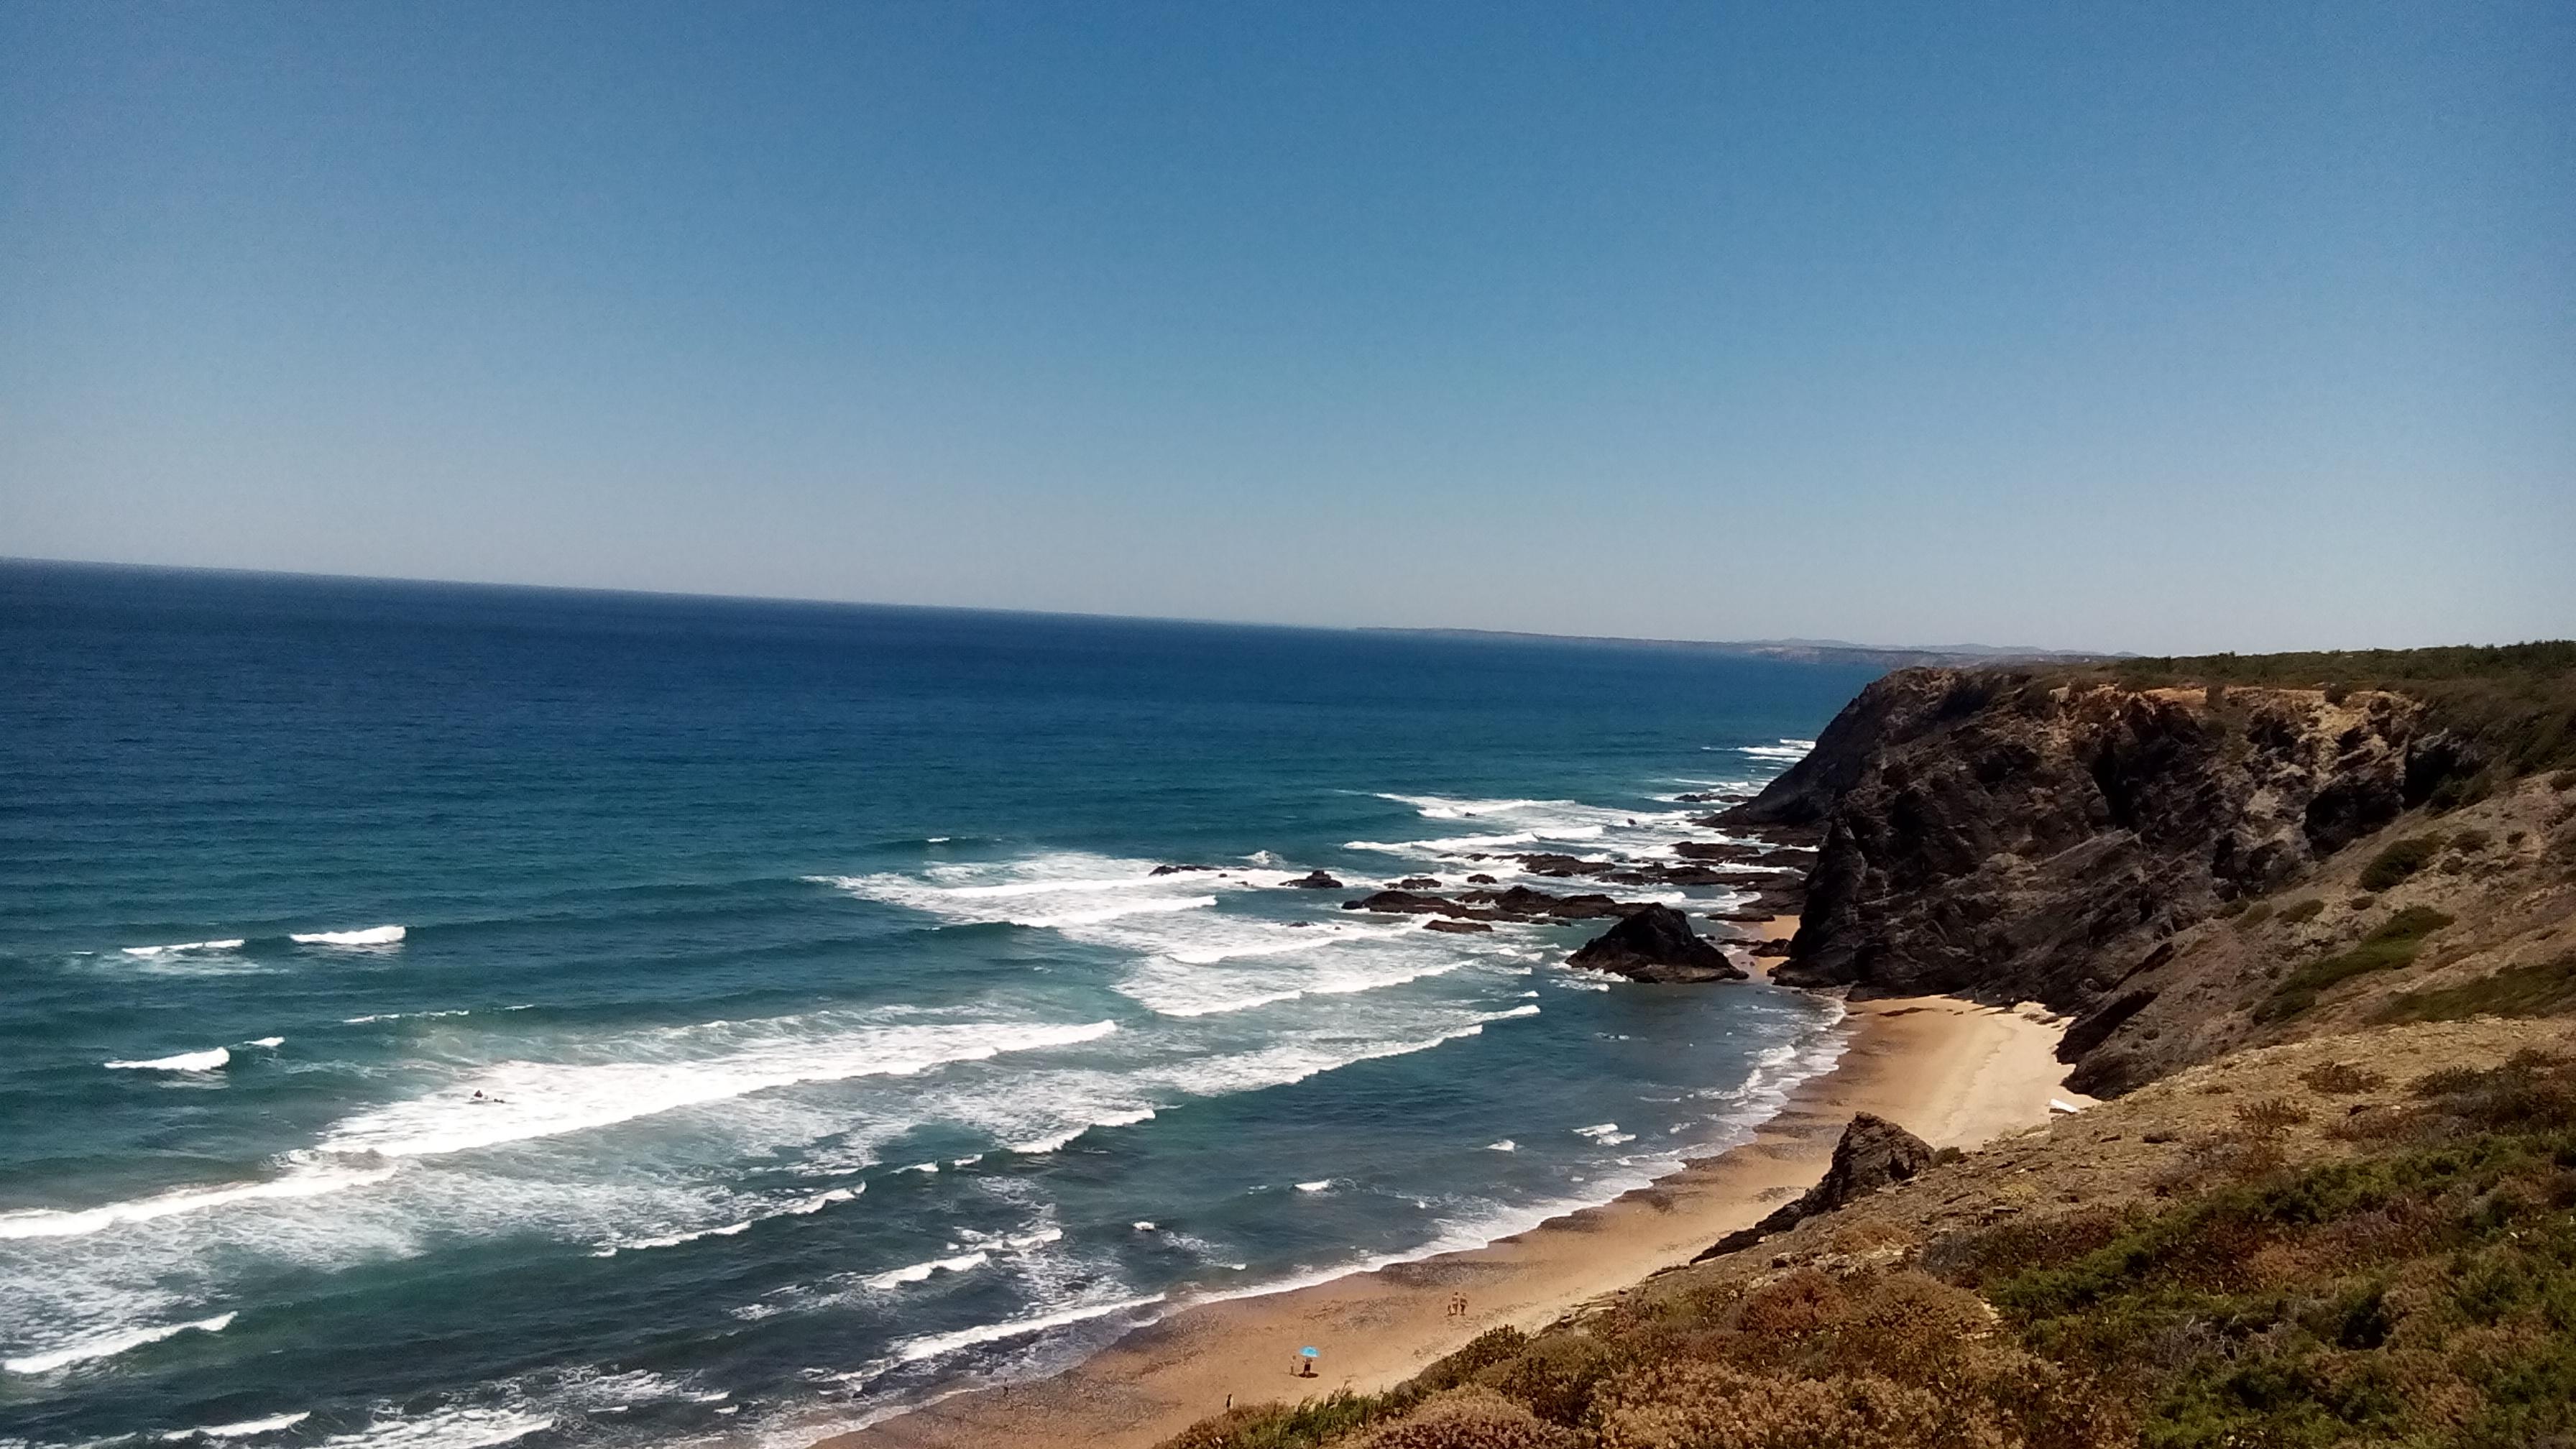 Acordar ao pé do Mar